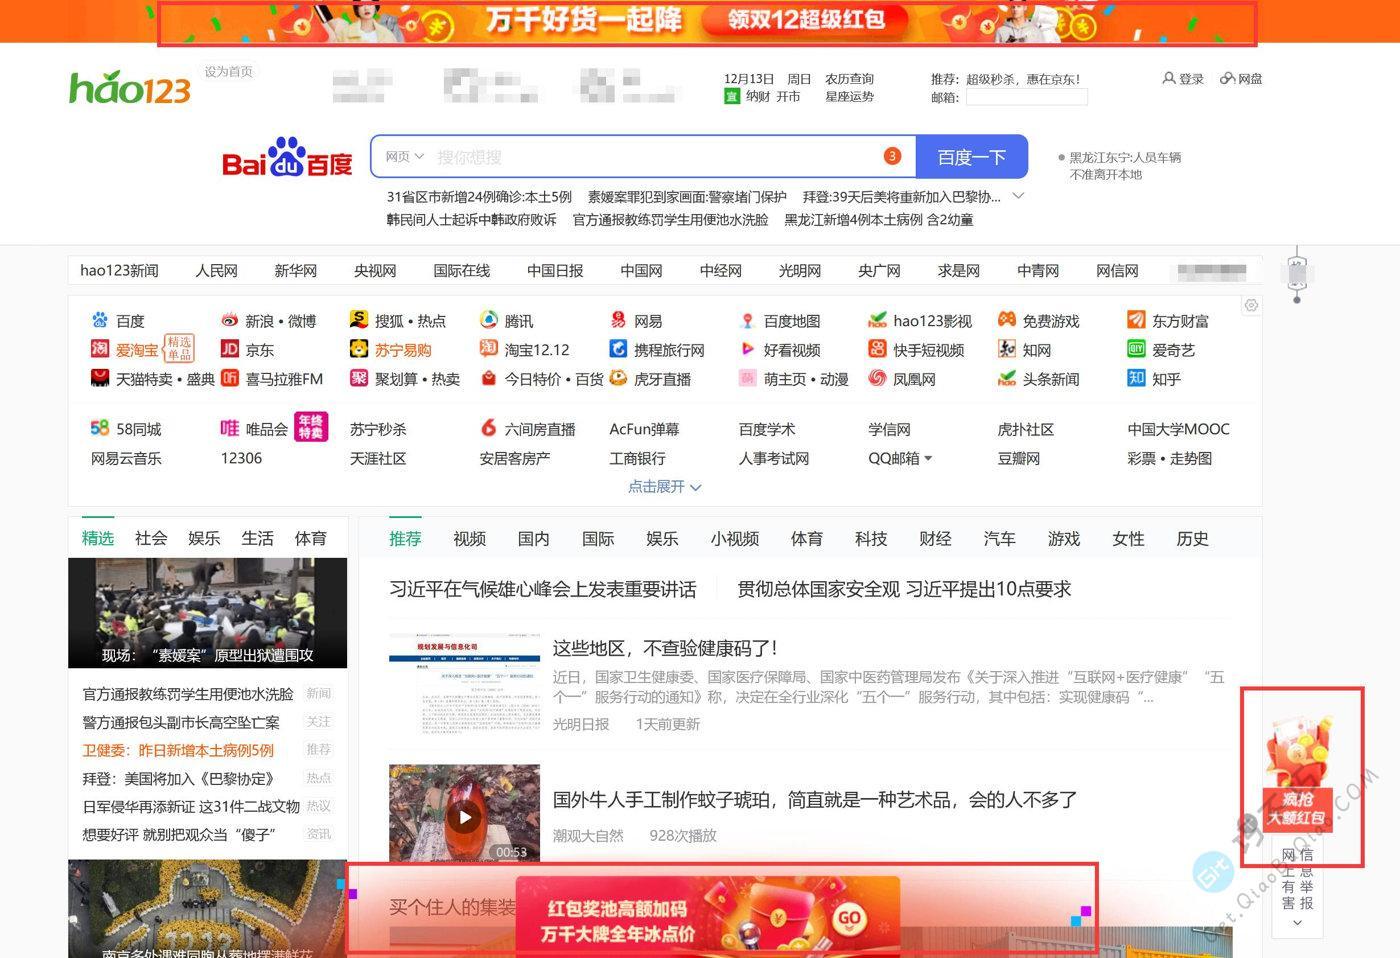 FireFox火狐浏览器拦截屏蔽各种网站的垃圾广告,还你干净